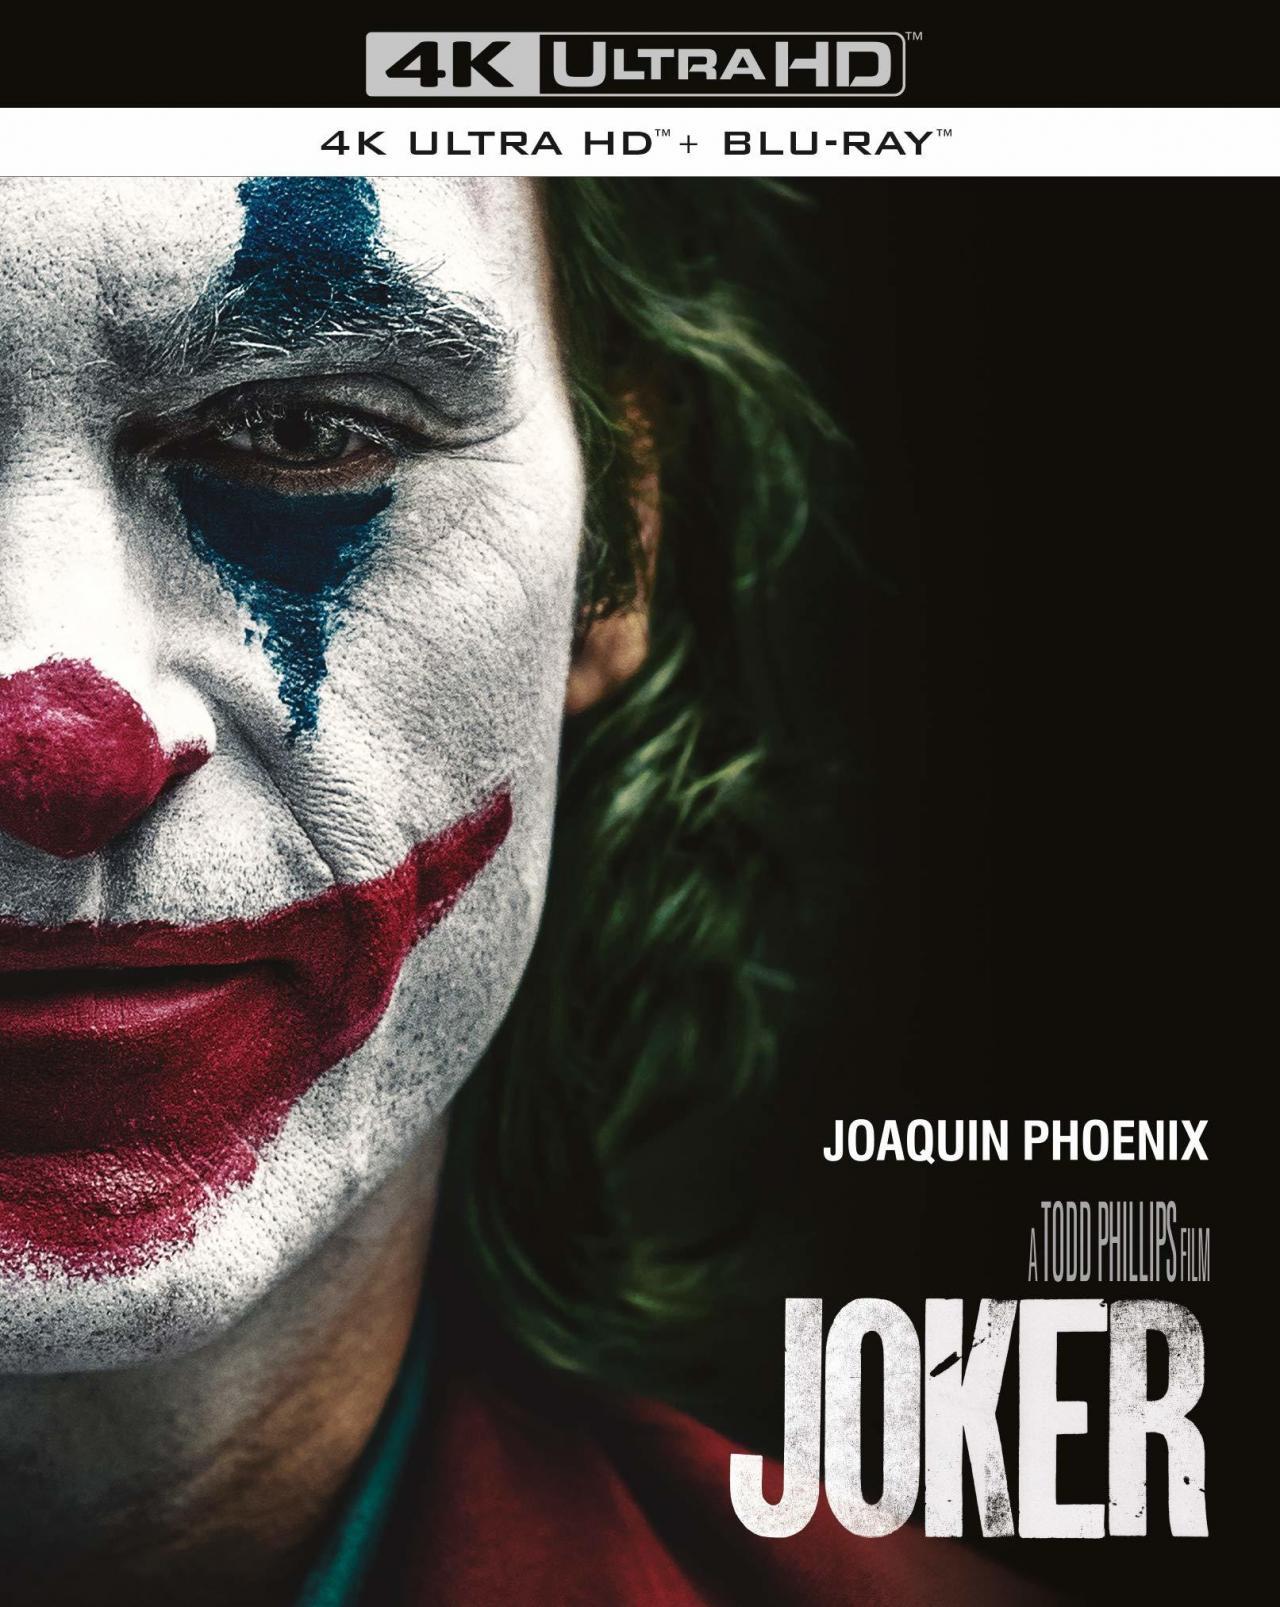 新碟 | 4K HDR 美影 | 小丑 Joker (2019)